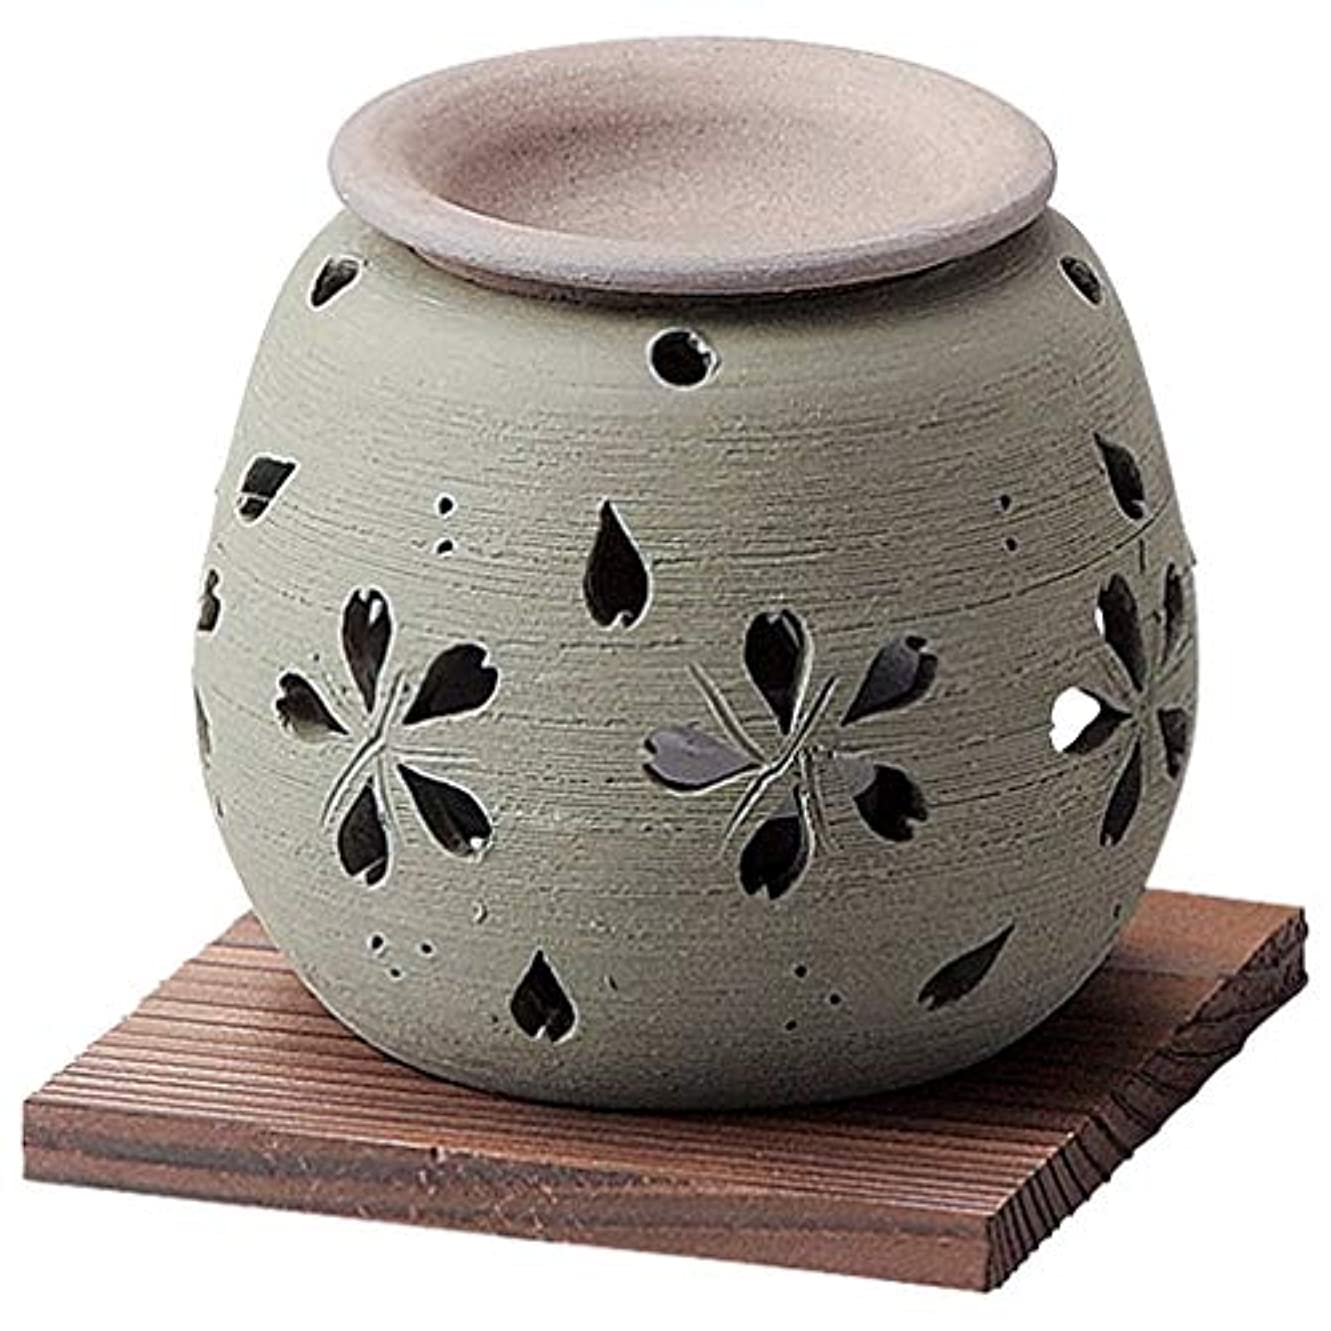 散歩伝記結果YI--Y-1618 常滑焼 茶香炉 径10×高さ9.5cm